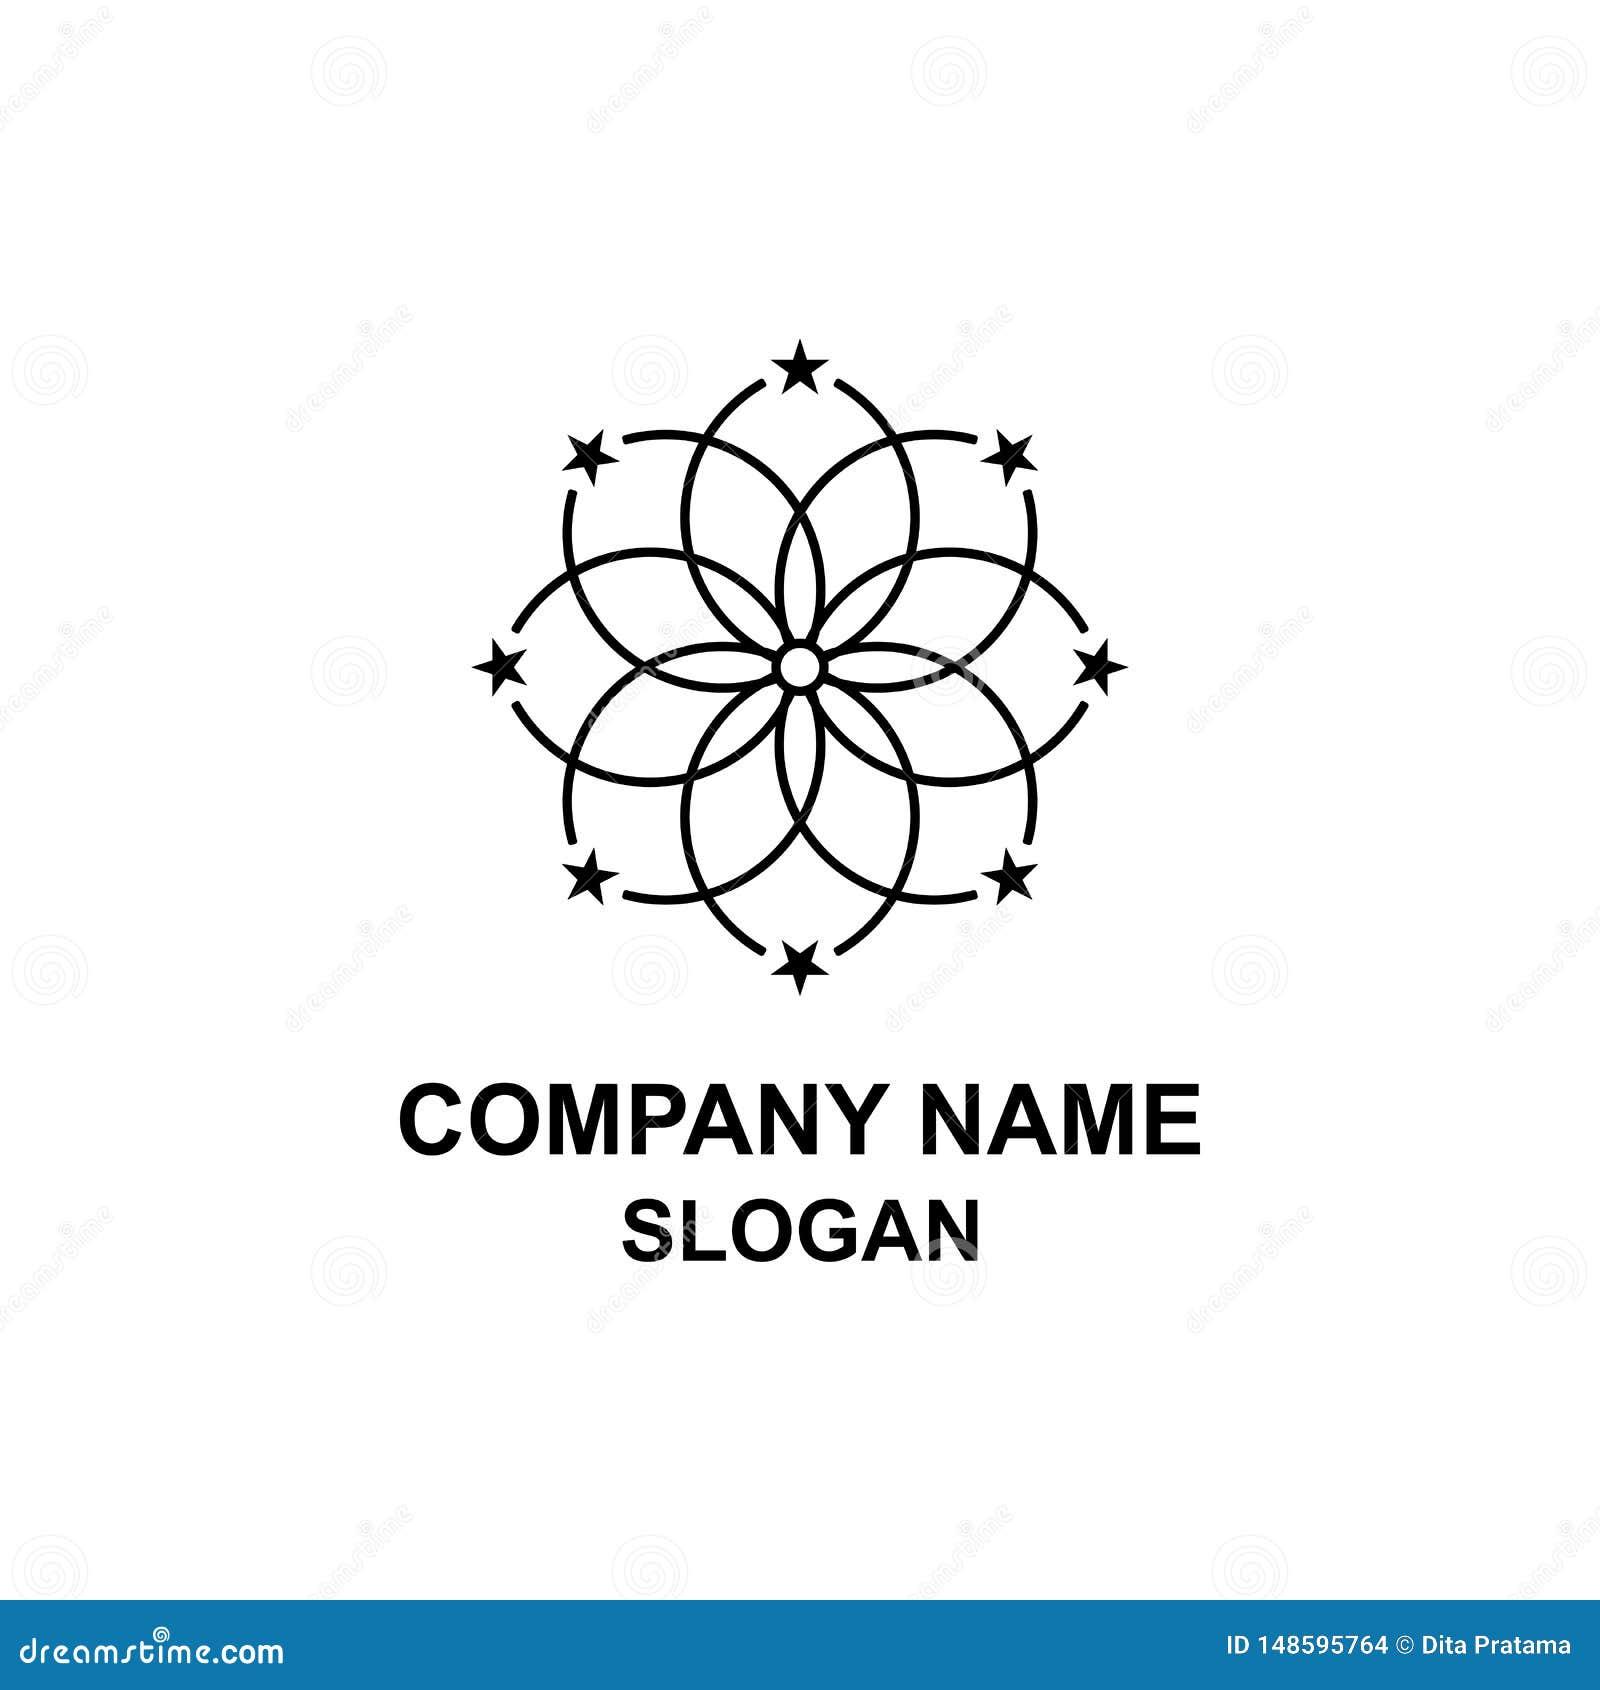 Logotipo chispeante de la estrella